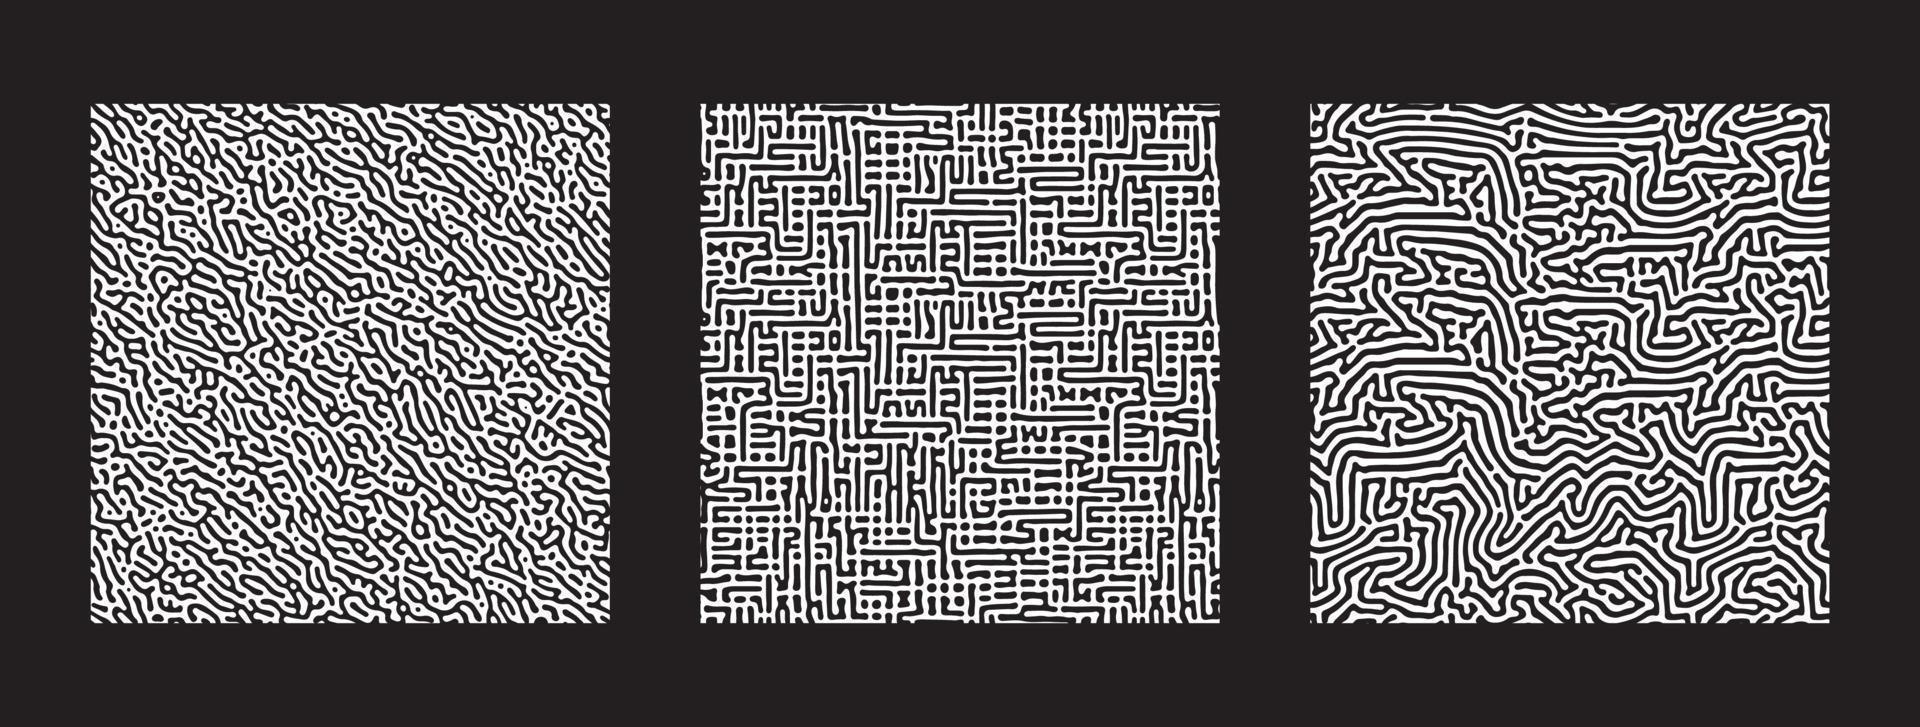 verzameling van turing abstract naadloos patroon. vector